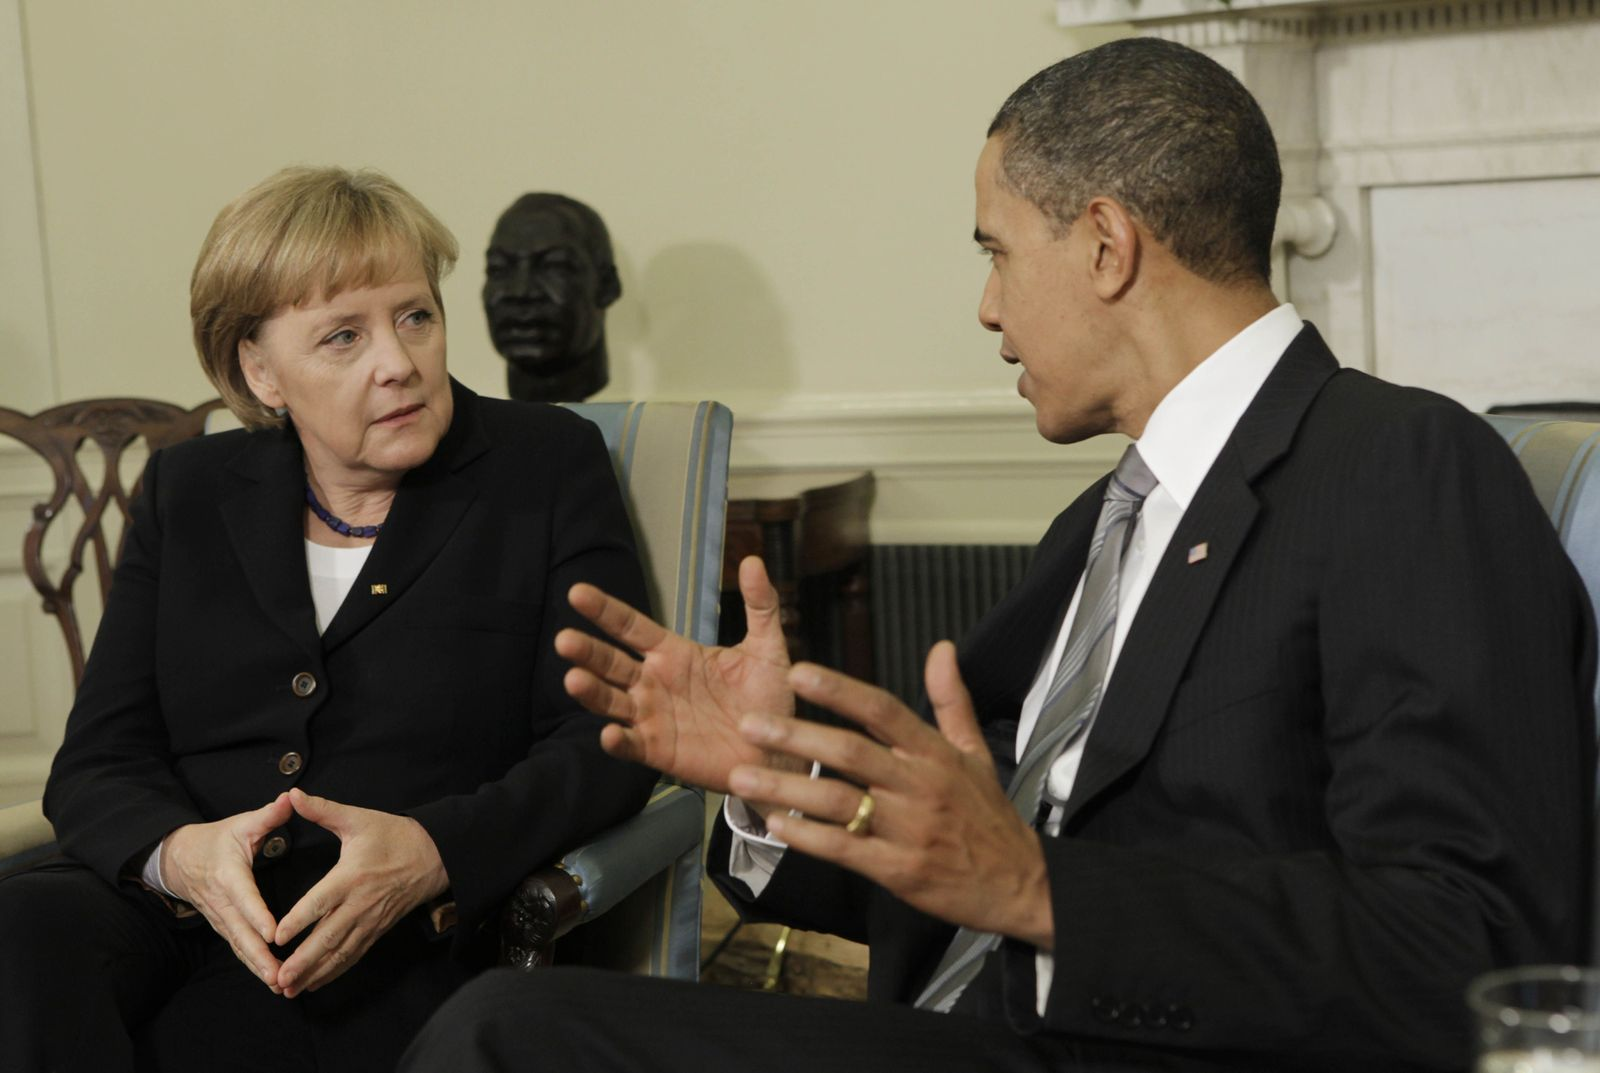 Merkel/ Obama